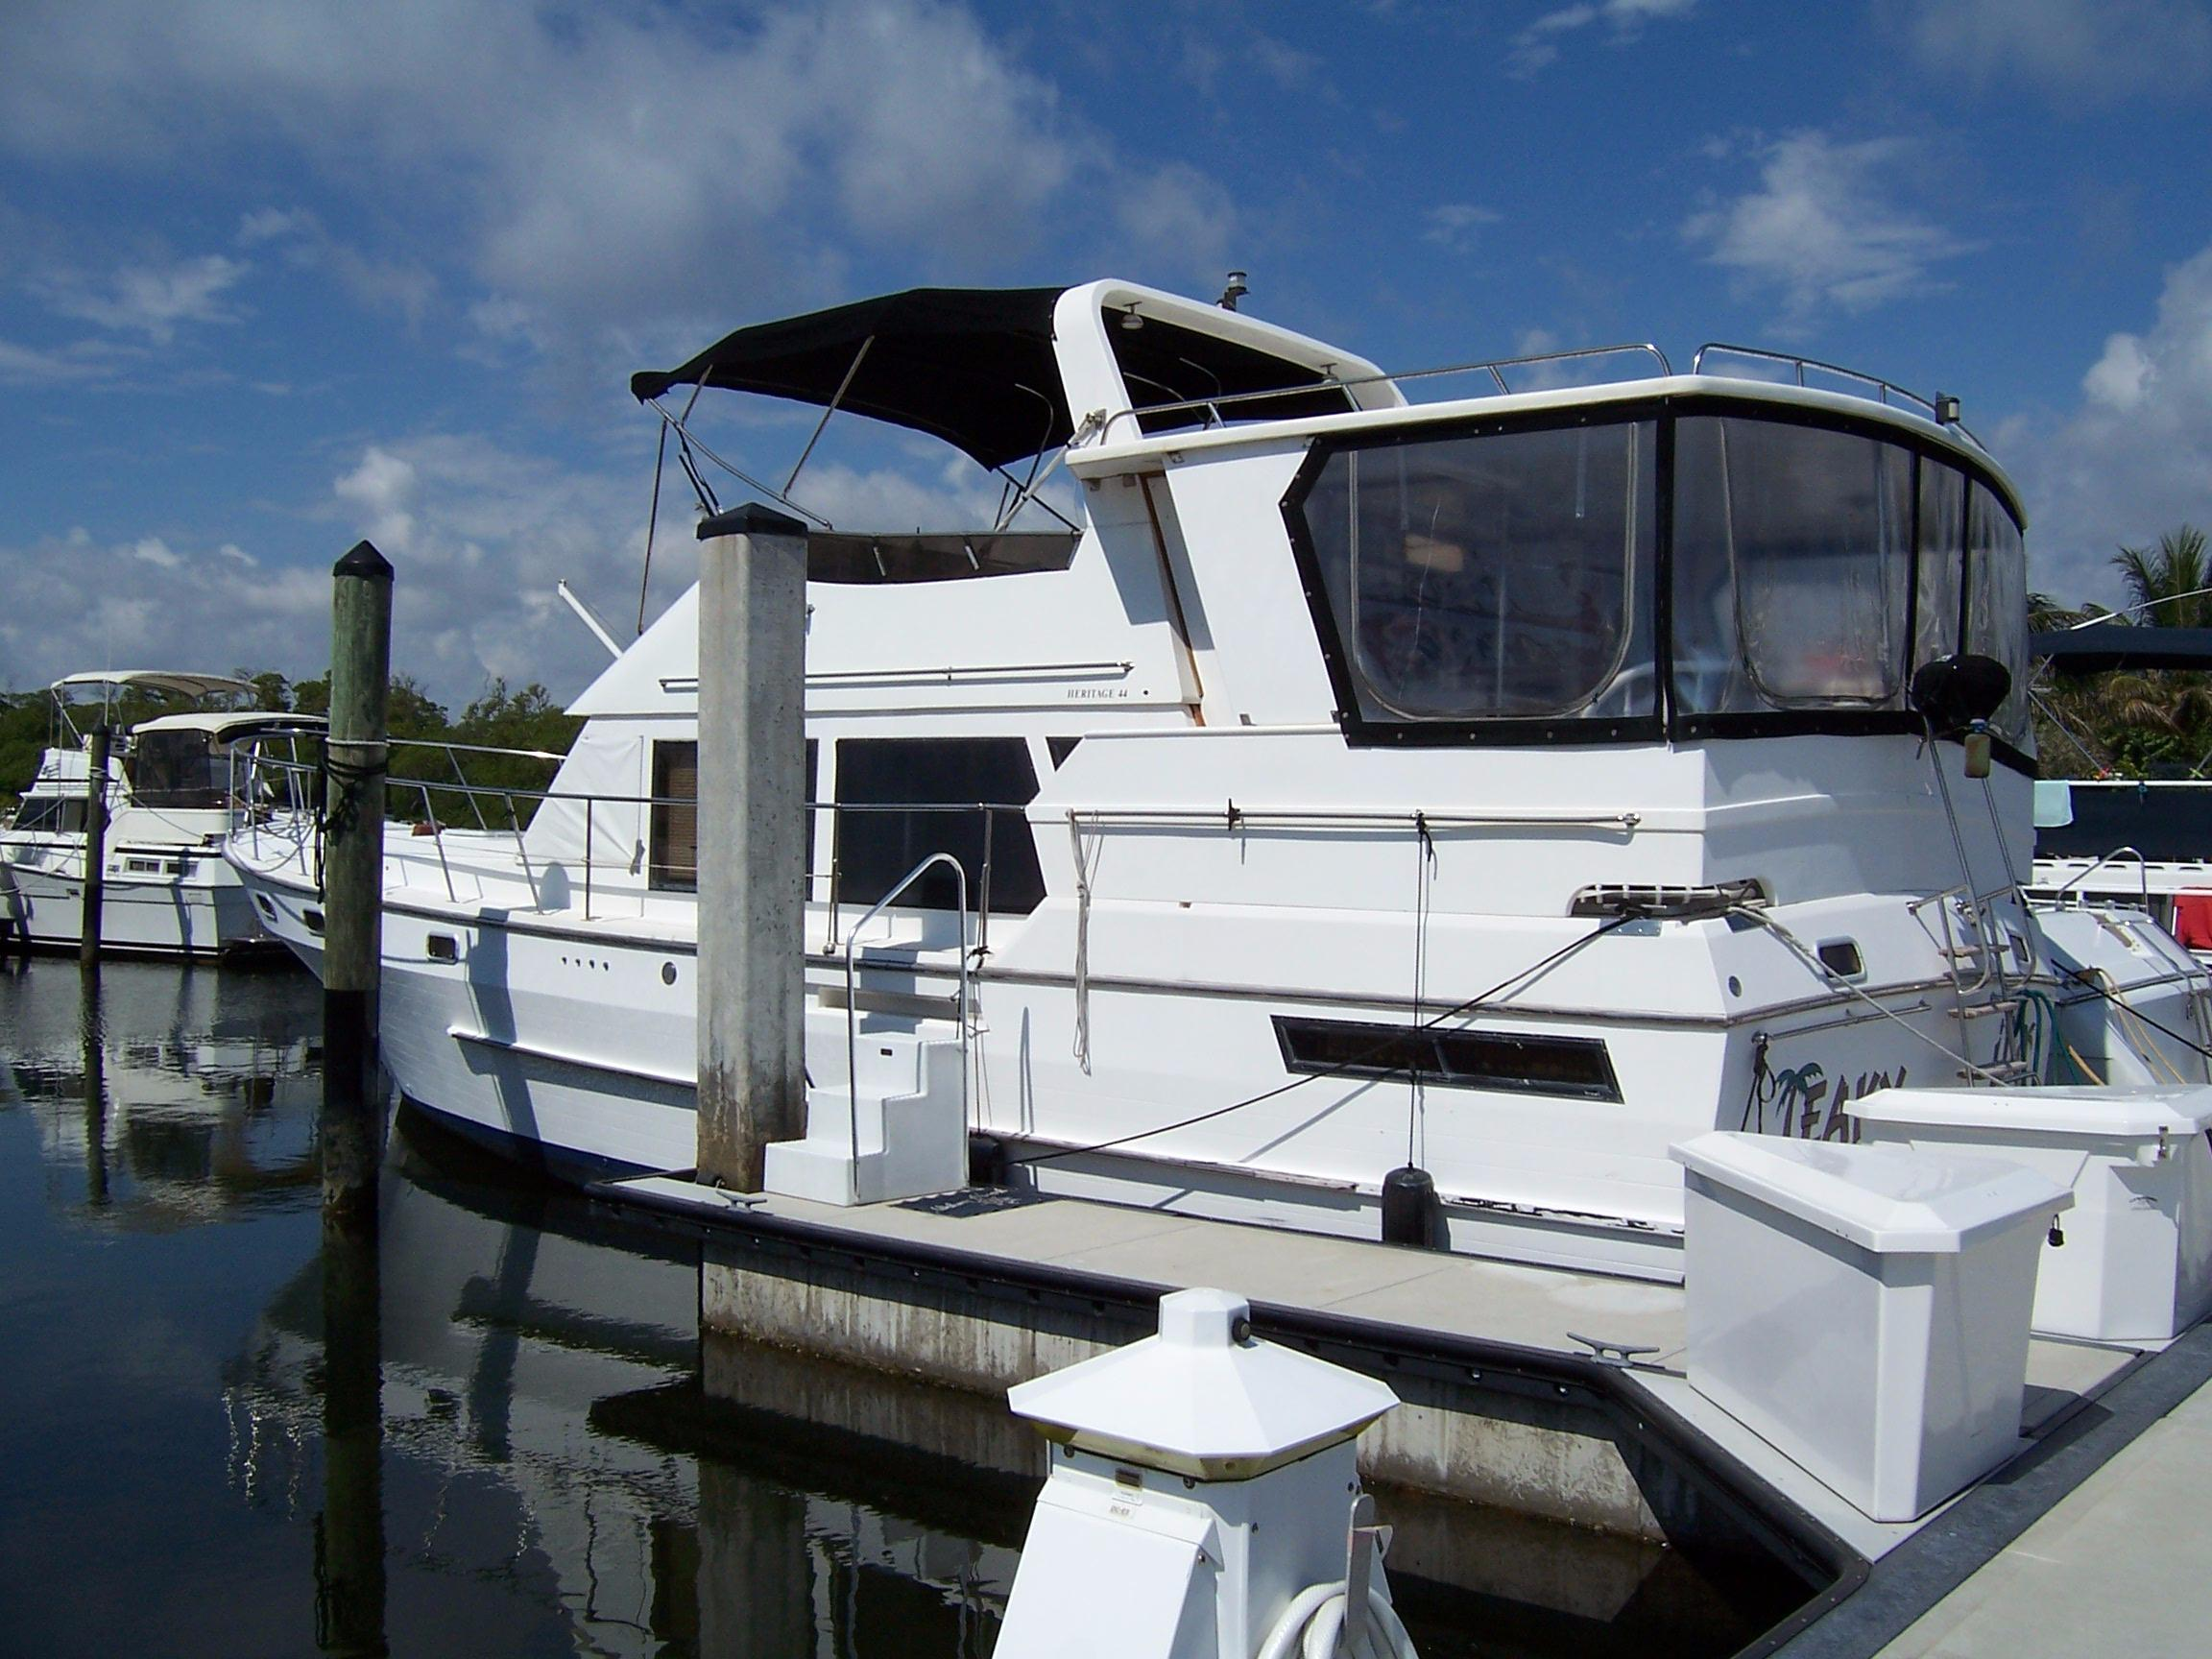 44' Heritage Nova 1989 Sundeck Trawler